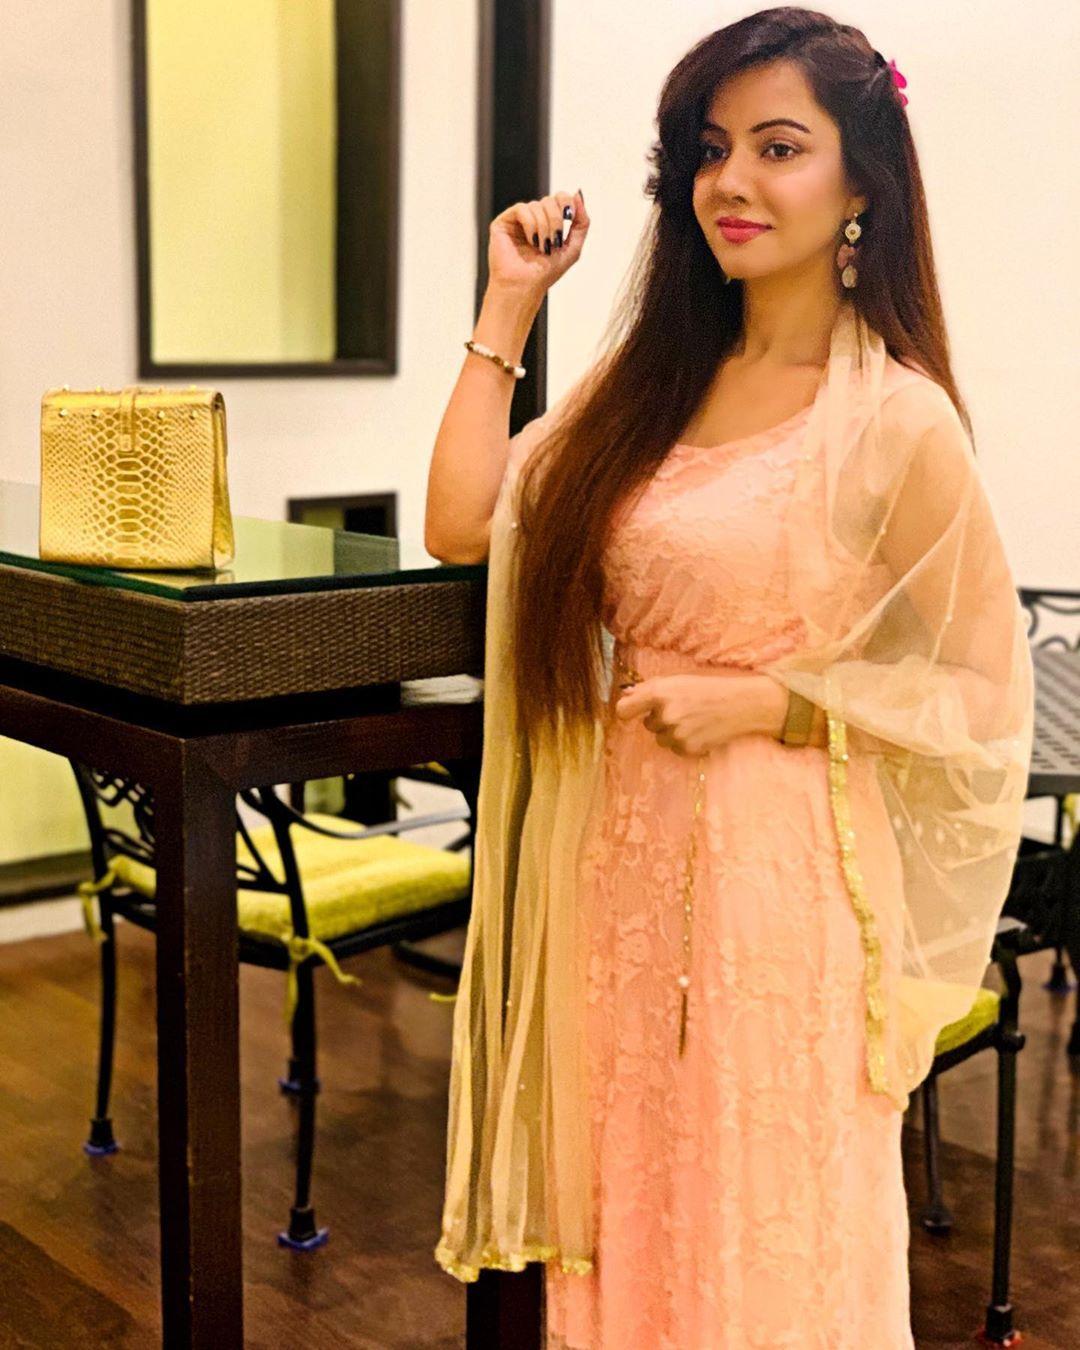 pakistani singer rabi peerzada nude video viral says allah